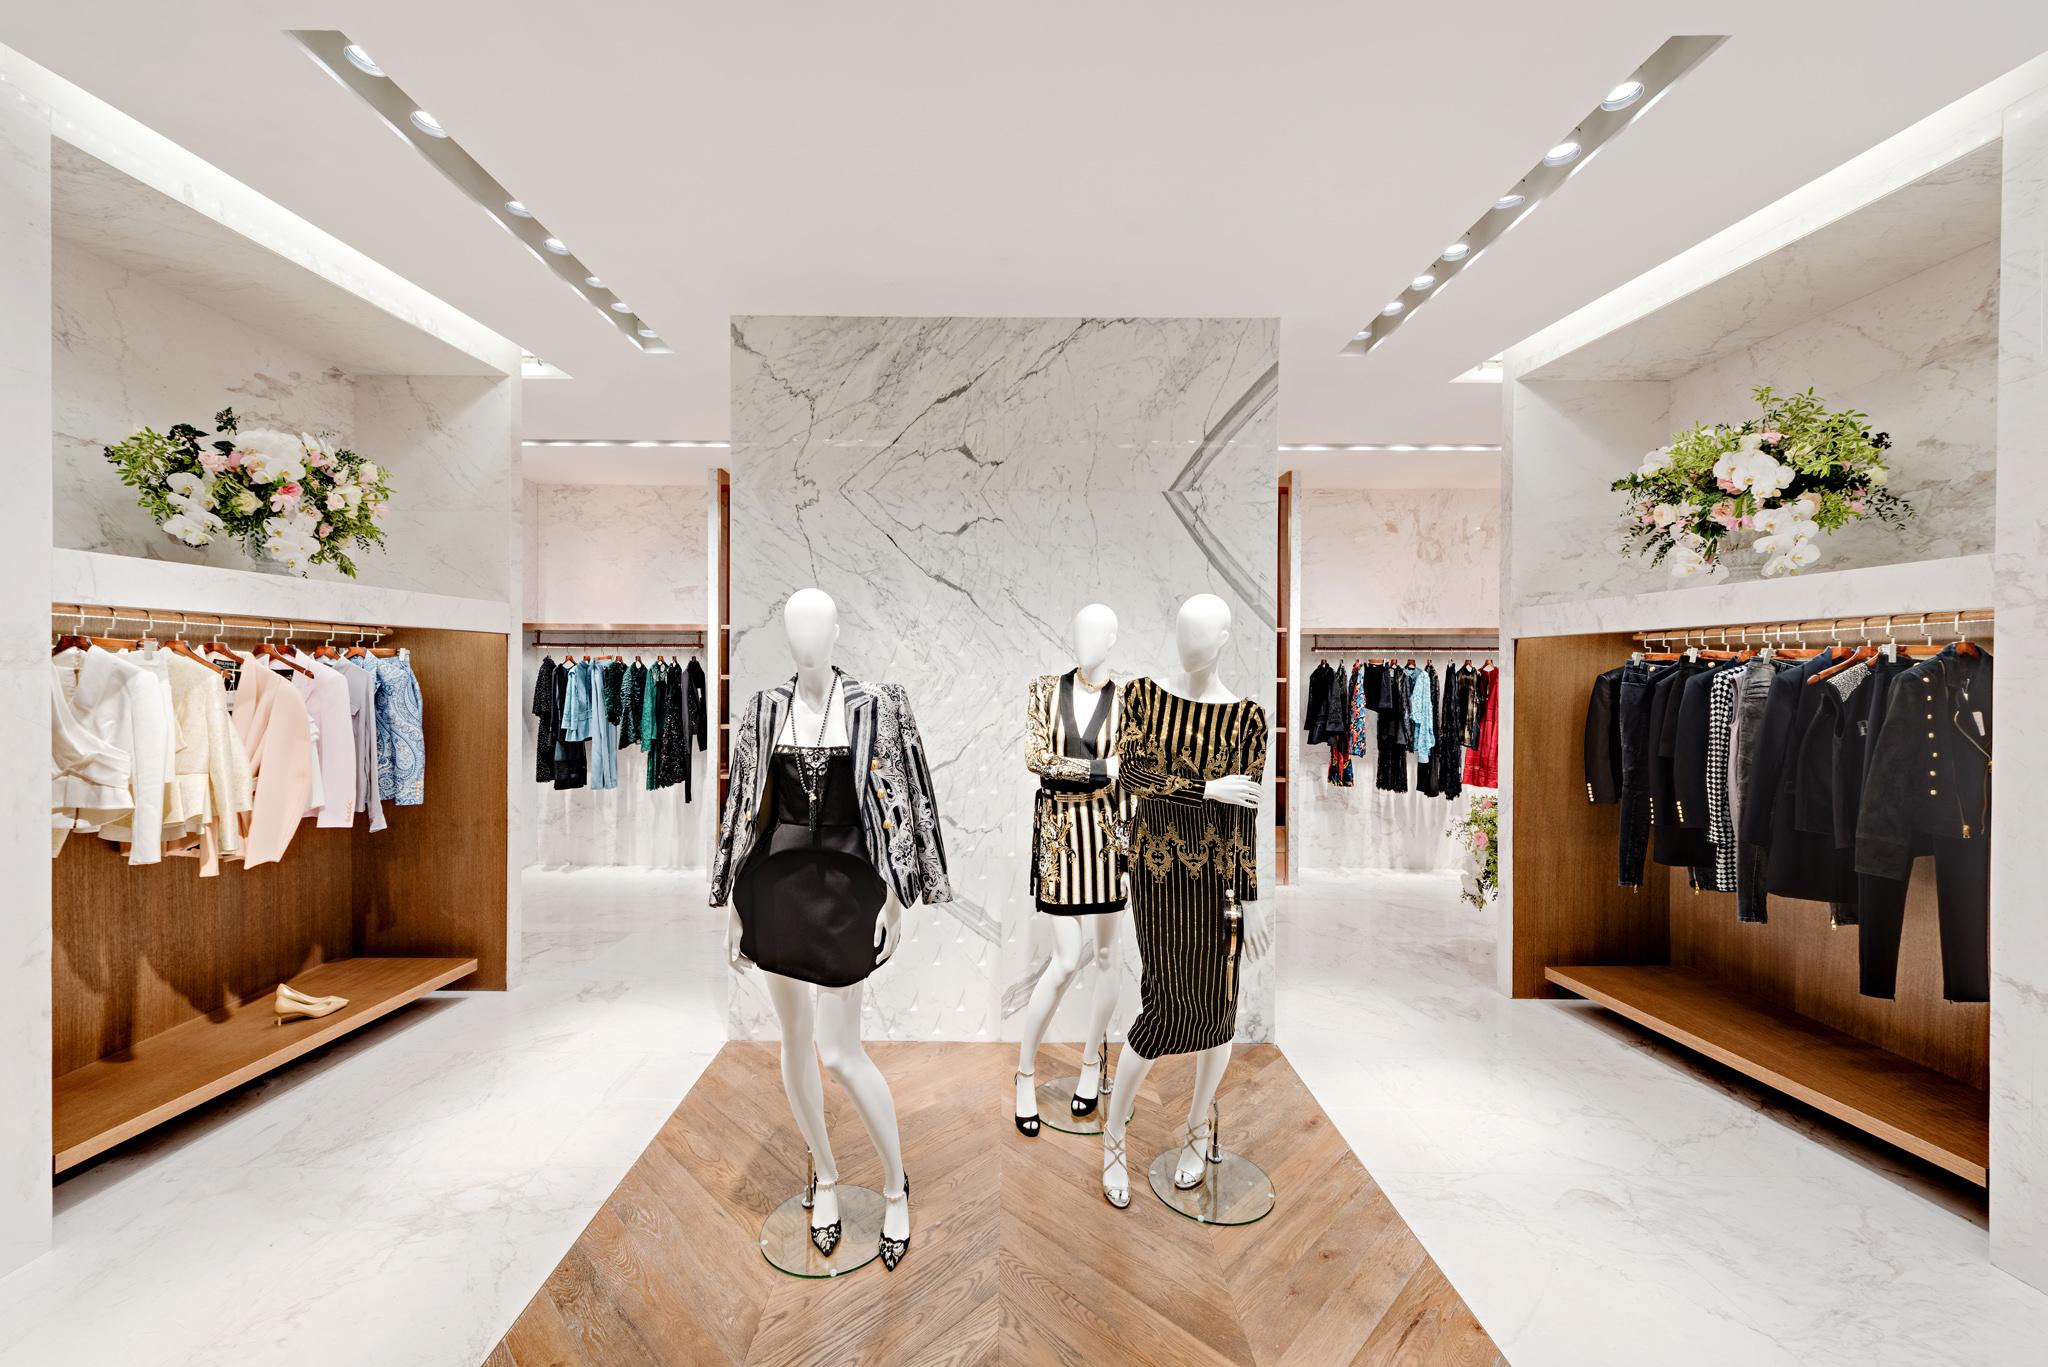 20161224 - Jacqueline - HCM - Commercial - Interior - Store - Retouch 0011.jpg